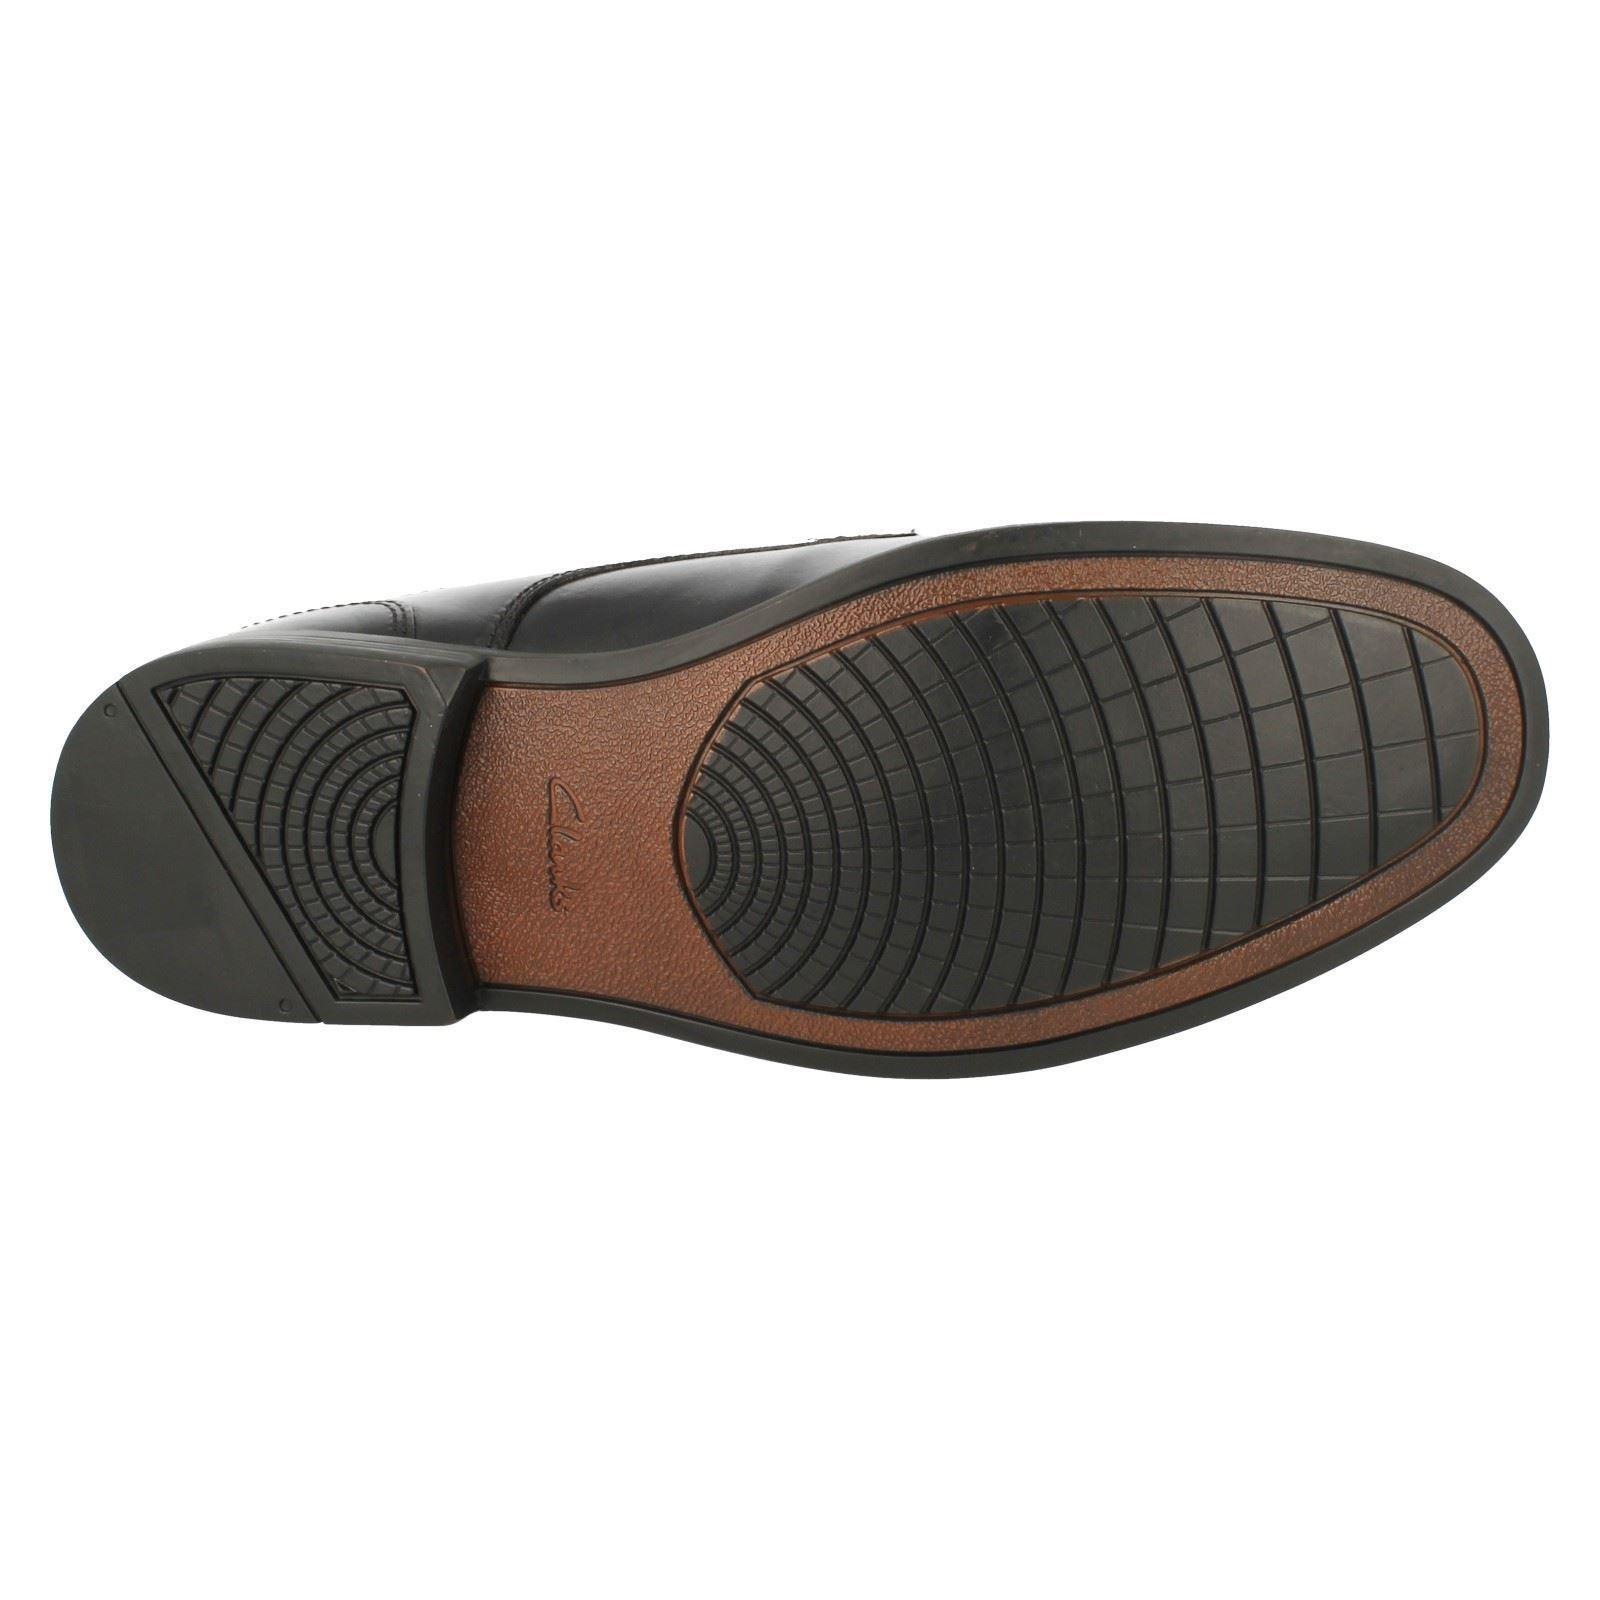 Para hombres zapatos zapatos hombres Clarks formal 'Beeston Tapa b99cad